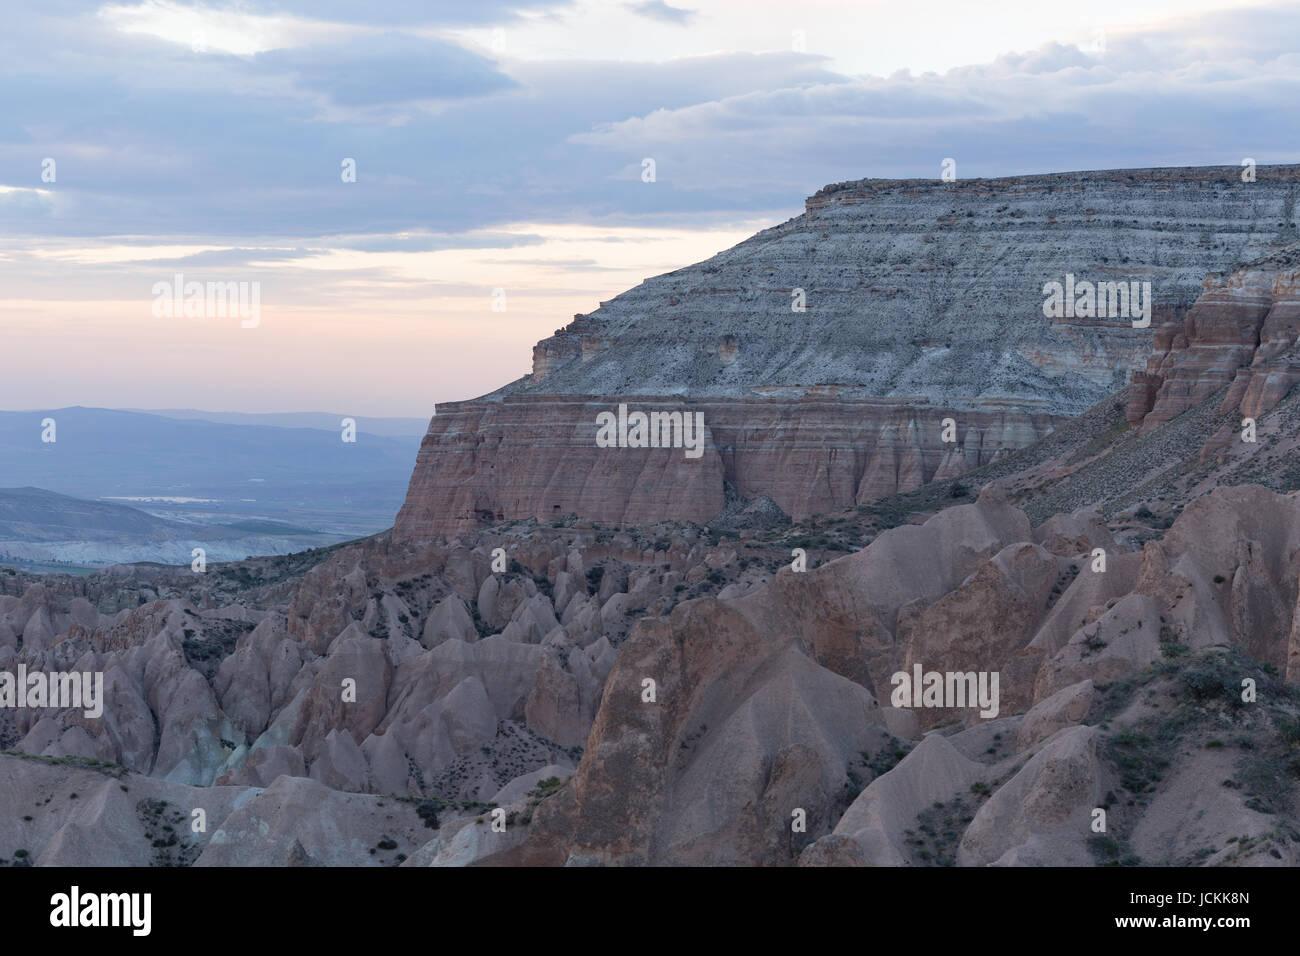 Horiziontal shot of rocky landscape of Cappadocia in Turkey - Stock Image